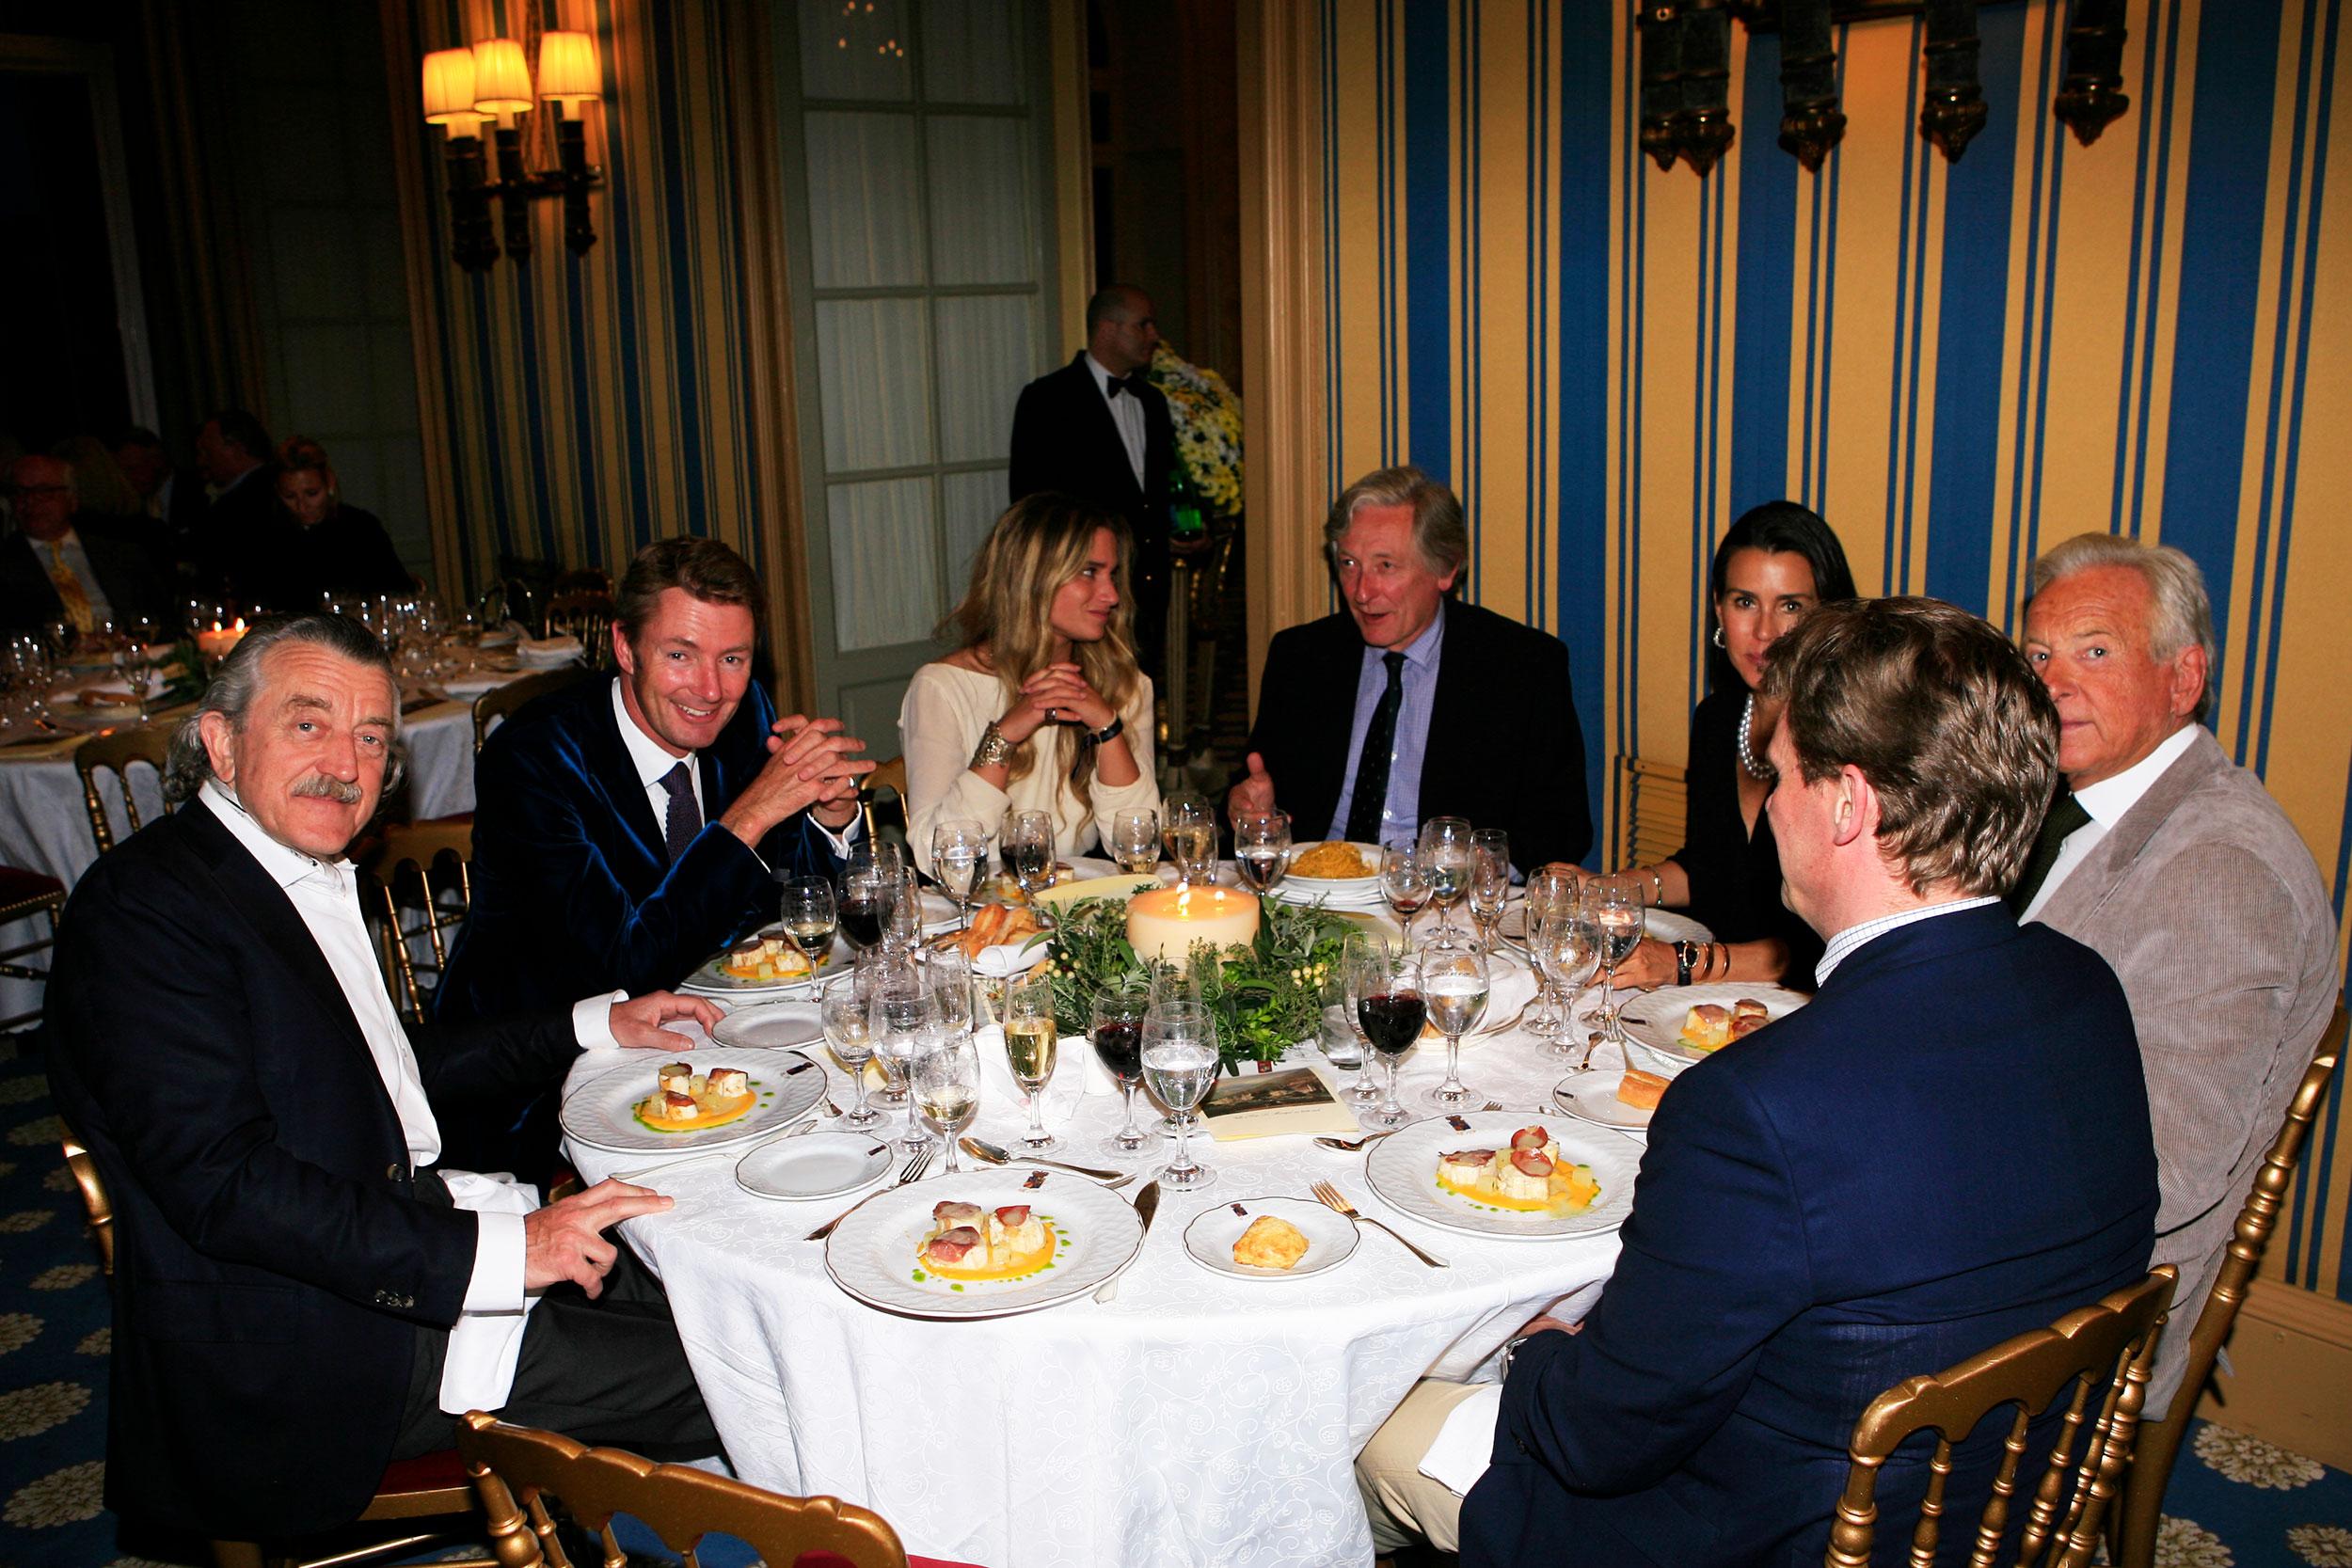 Dining at Villa d'Este with Simon Kidston,  Italian Job actor David Salamone,  Collector Jean-Pierre Slavic, and e.g. Jury Dieter Meier